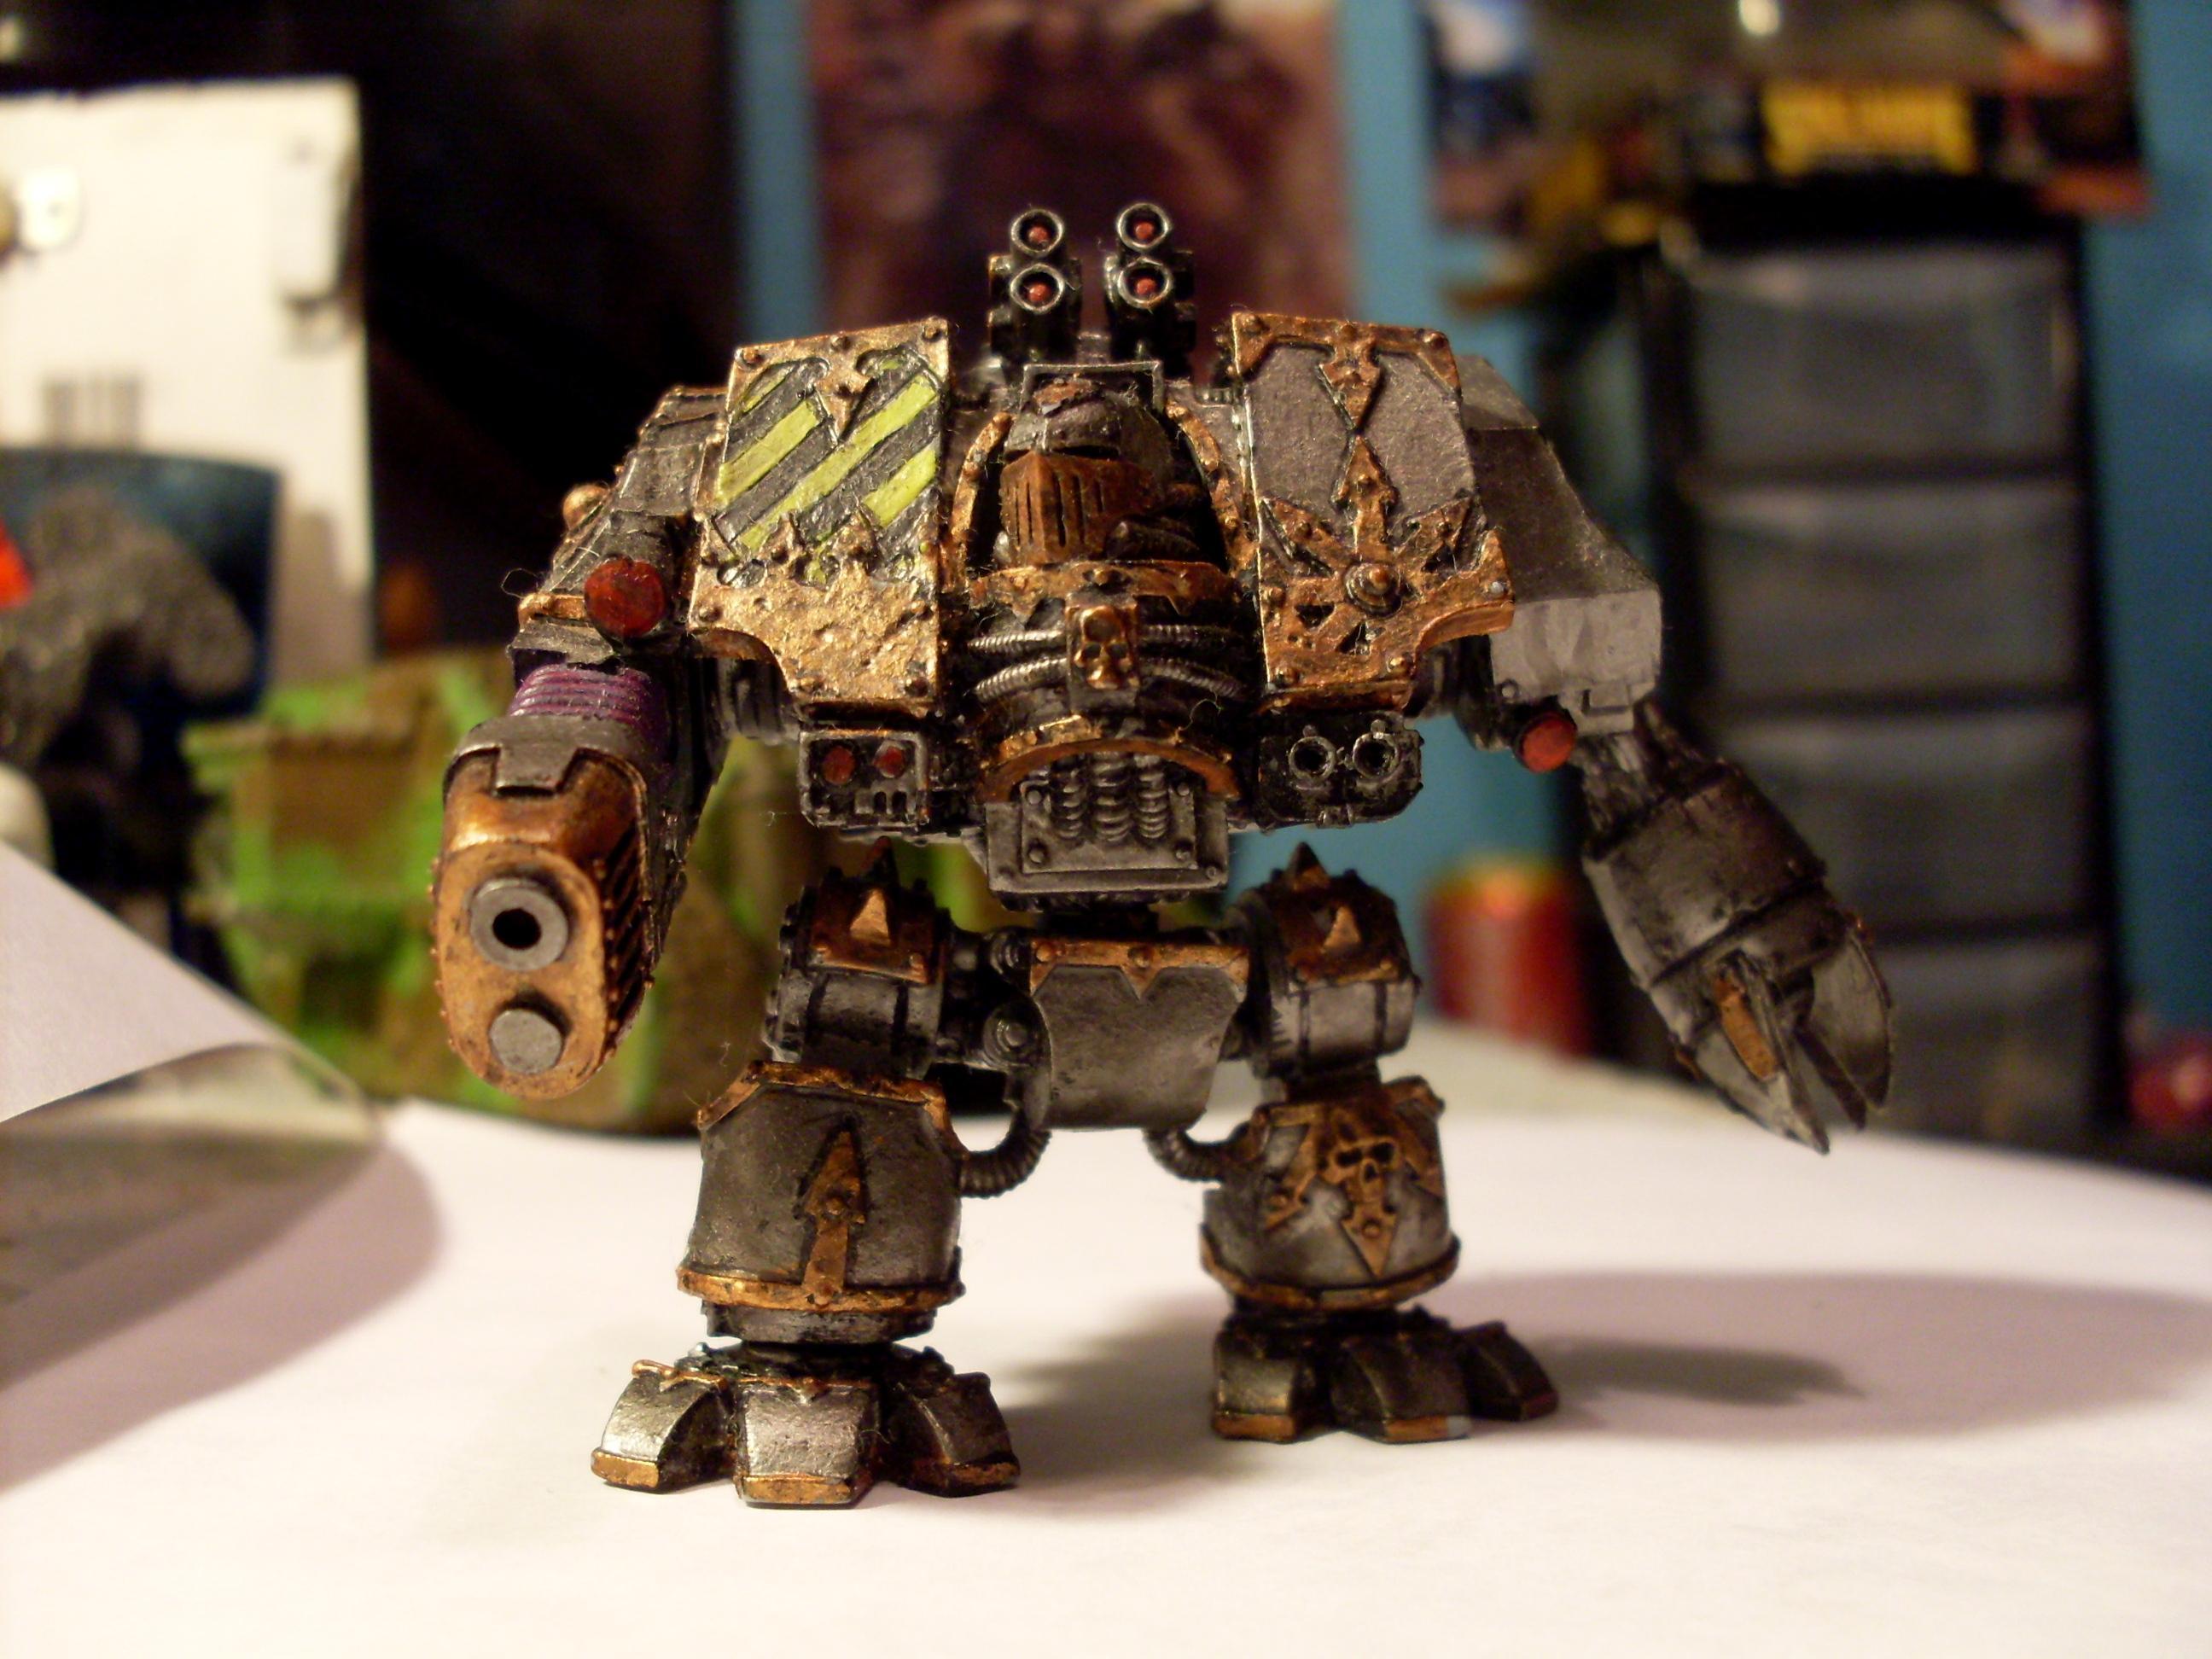 Chaos, Chaos Dreadnought, Chaos Space Marines, Dreadnought, Helbrute, Iron Warriors, Plasma Cannon, Warhammer 40,000